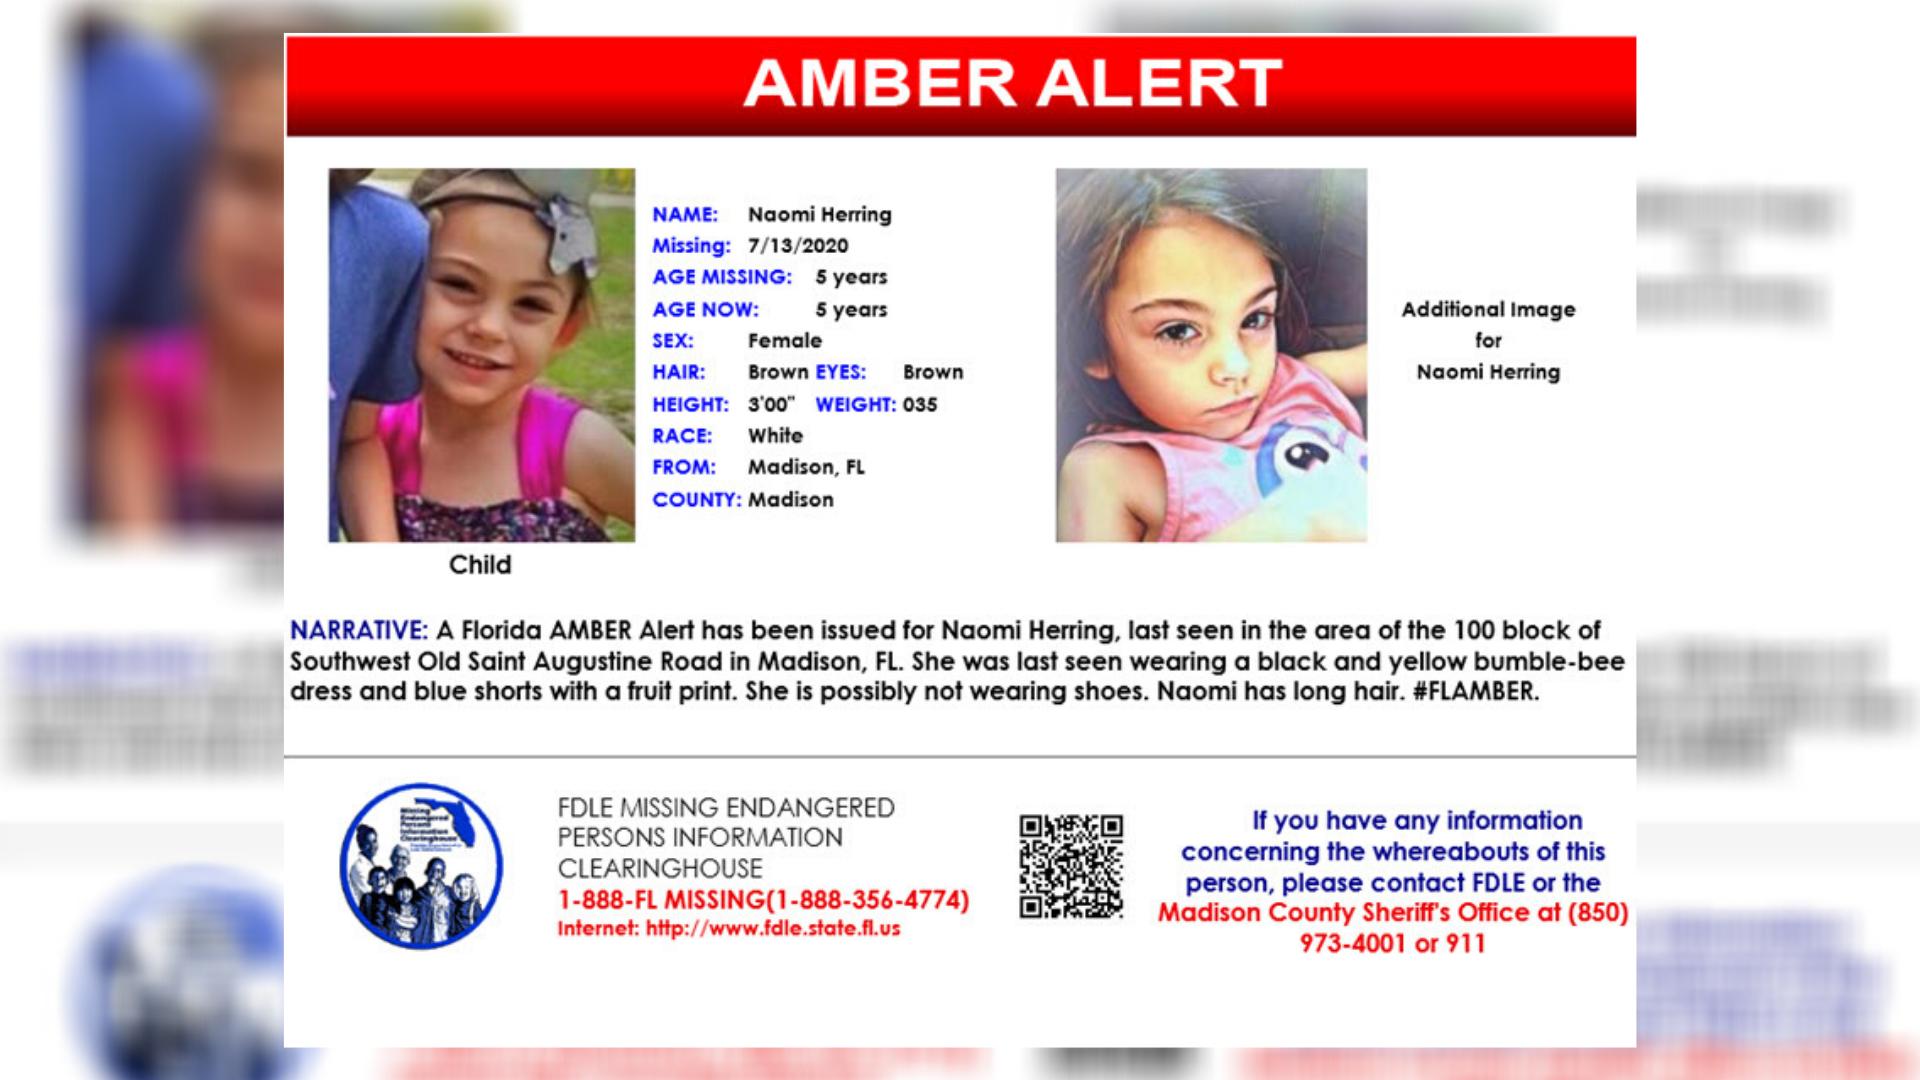 Amber Alert Canceled For 5 Year Old Florida Girl